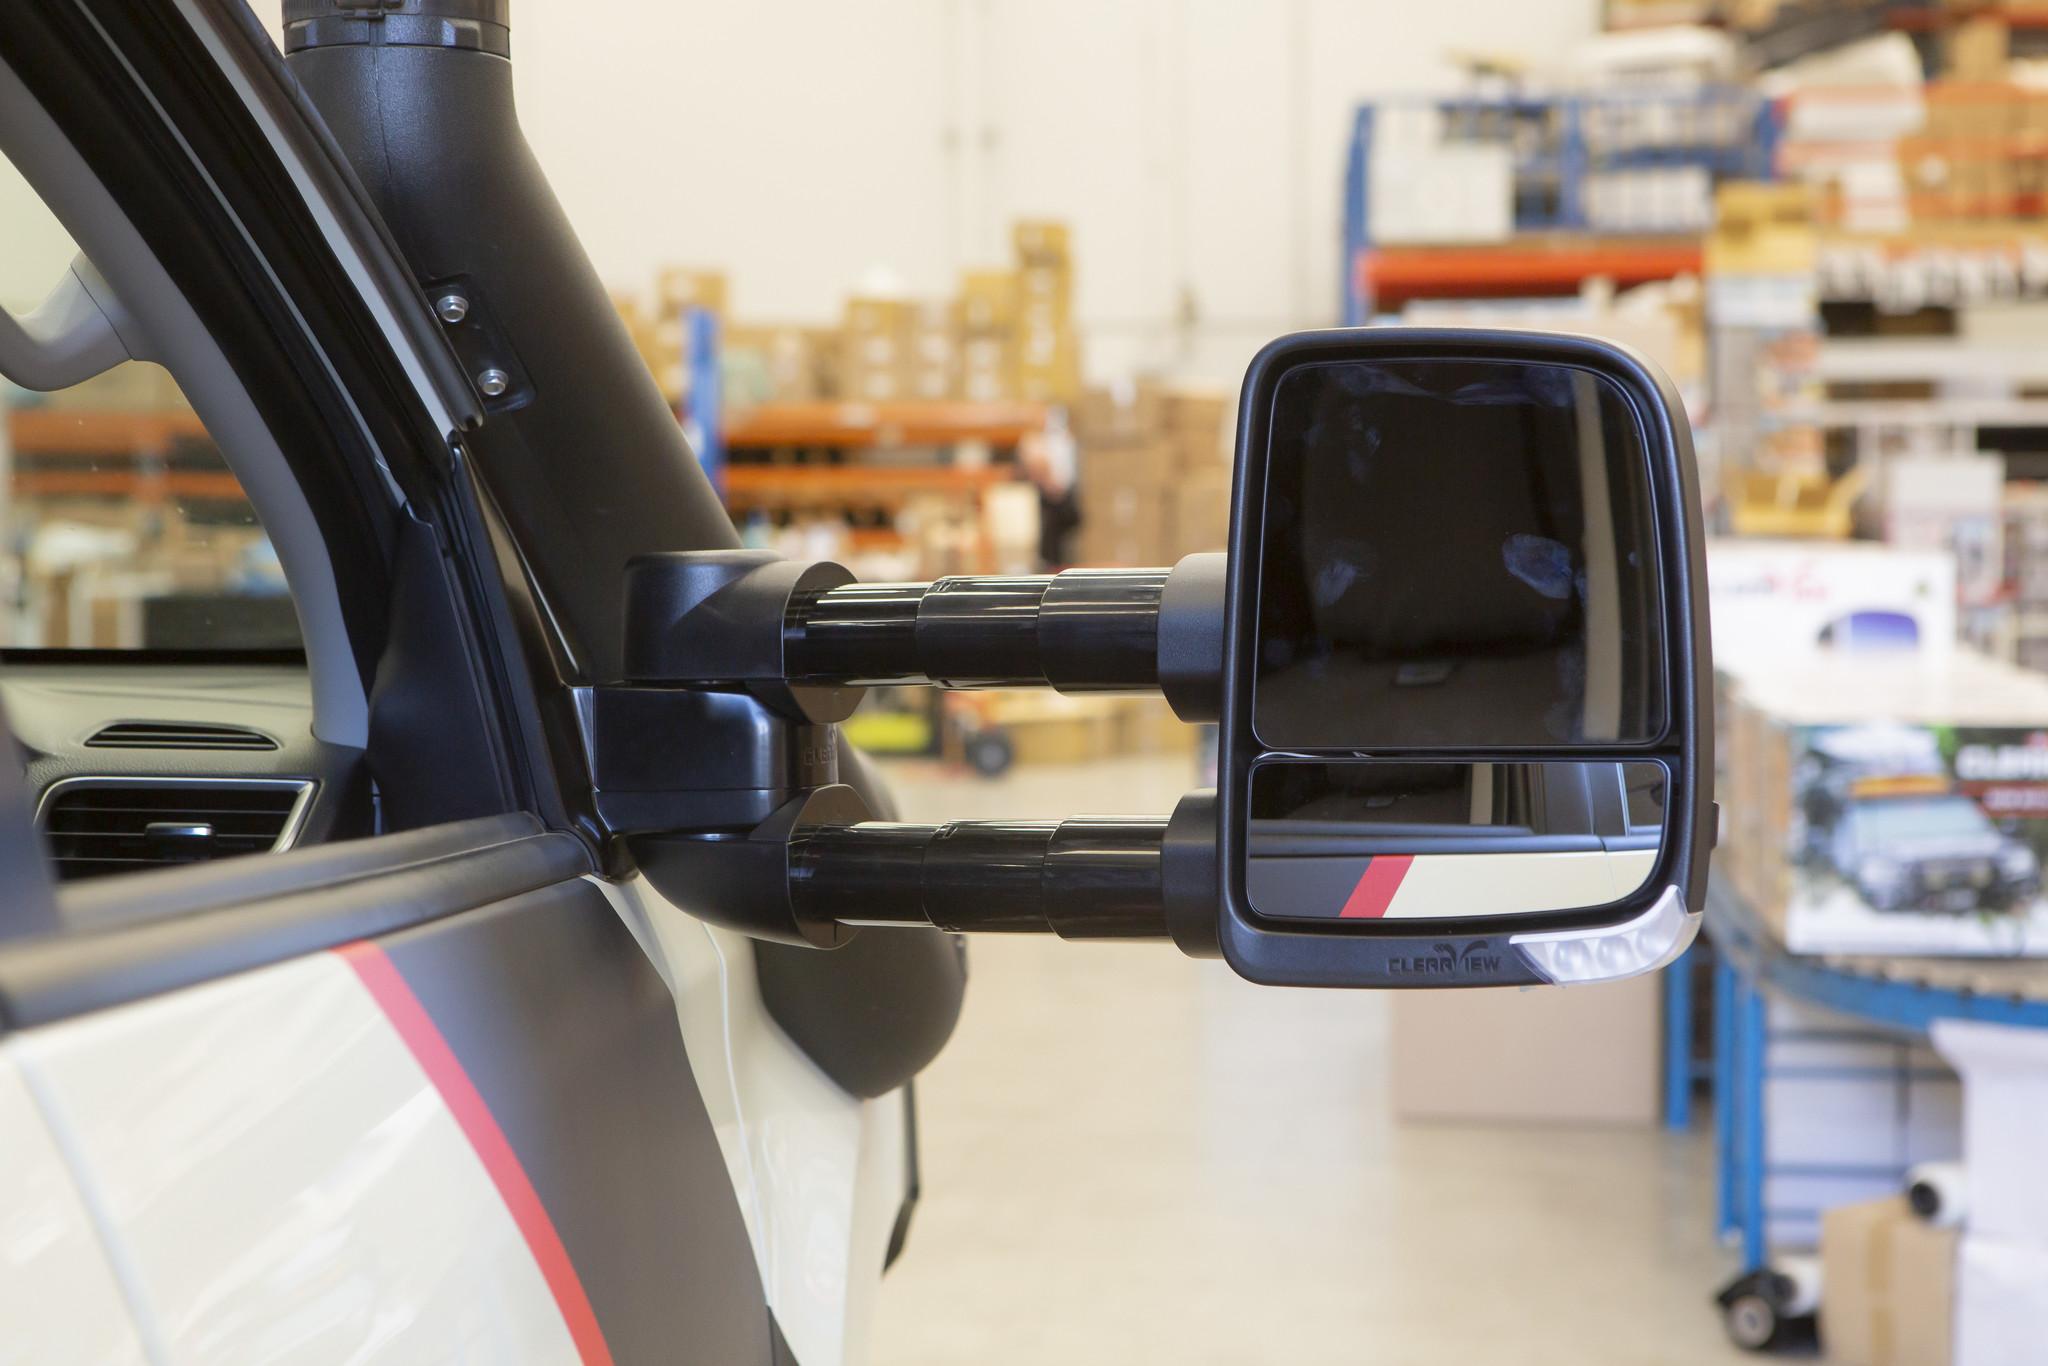 Toyota Next Generation Mirrors Mitsubishi L200 2015+